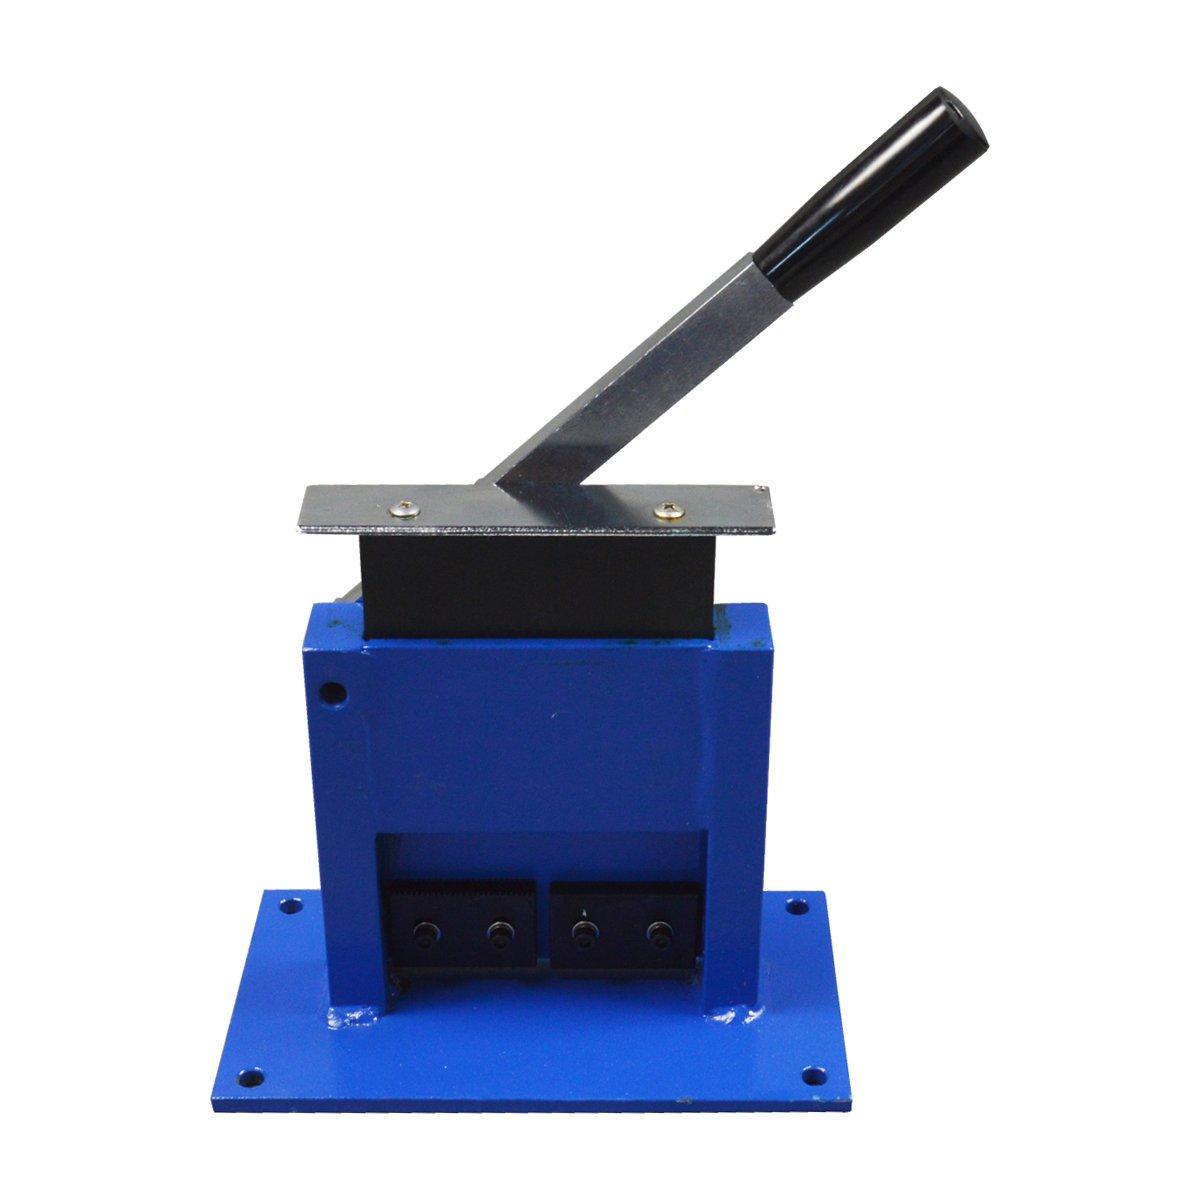 TECHTONGDA Aluminum Laminate Tube Crimping Sealing machine Manual Heavy Duty Tube Sealer(item# 251907)